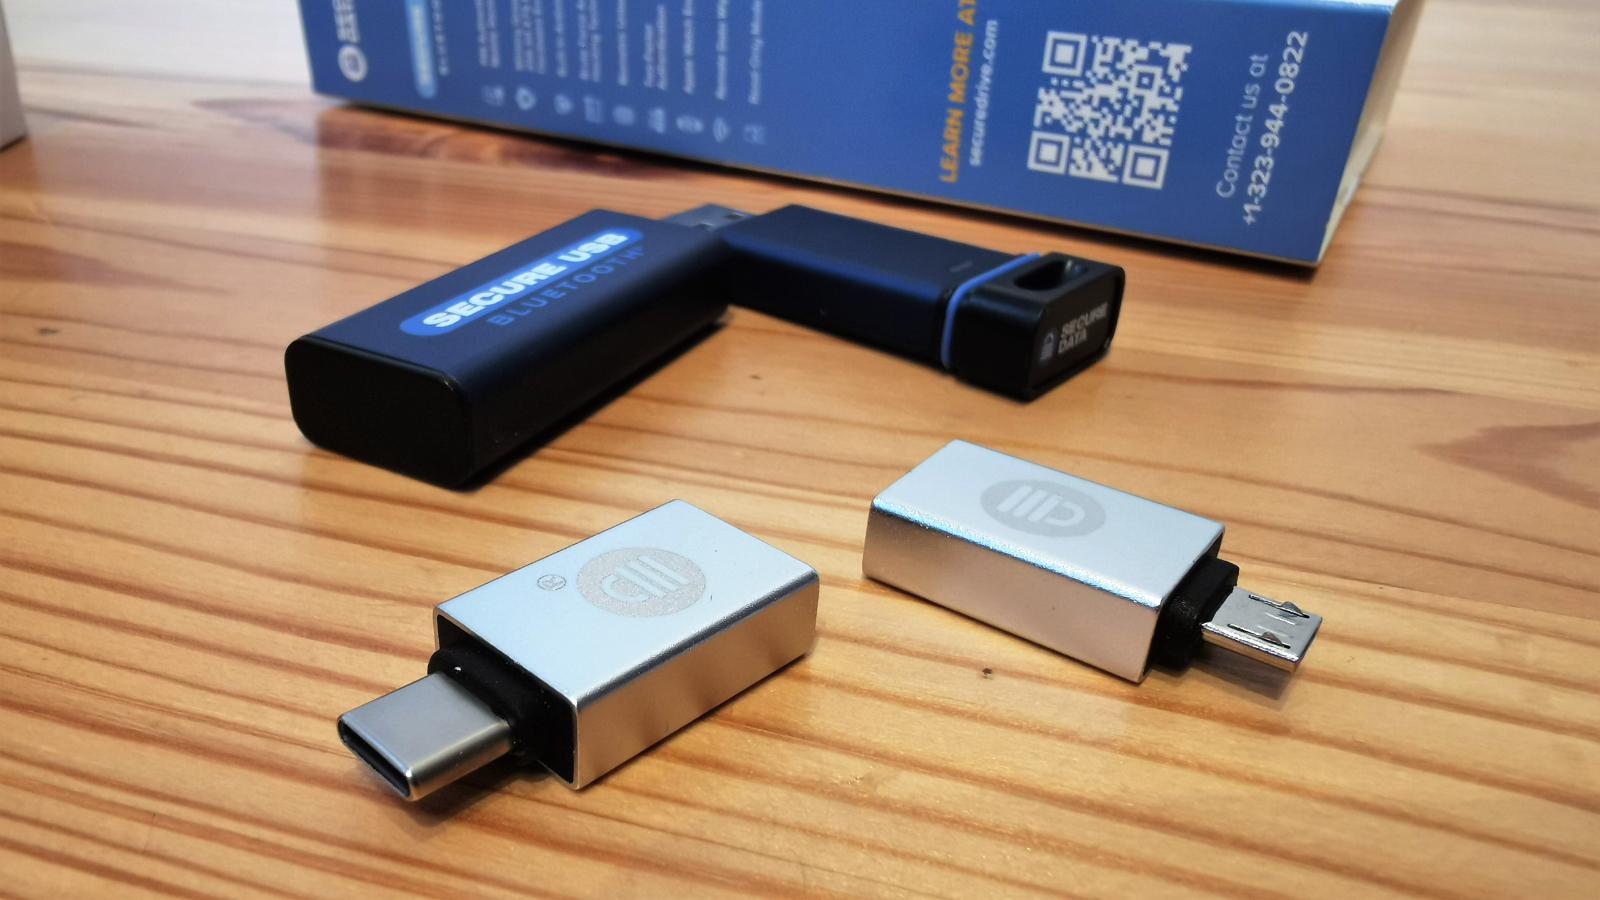 SecureData SecureUSB BT 32GB